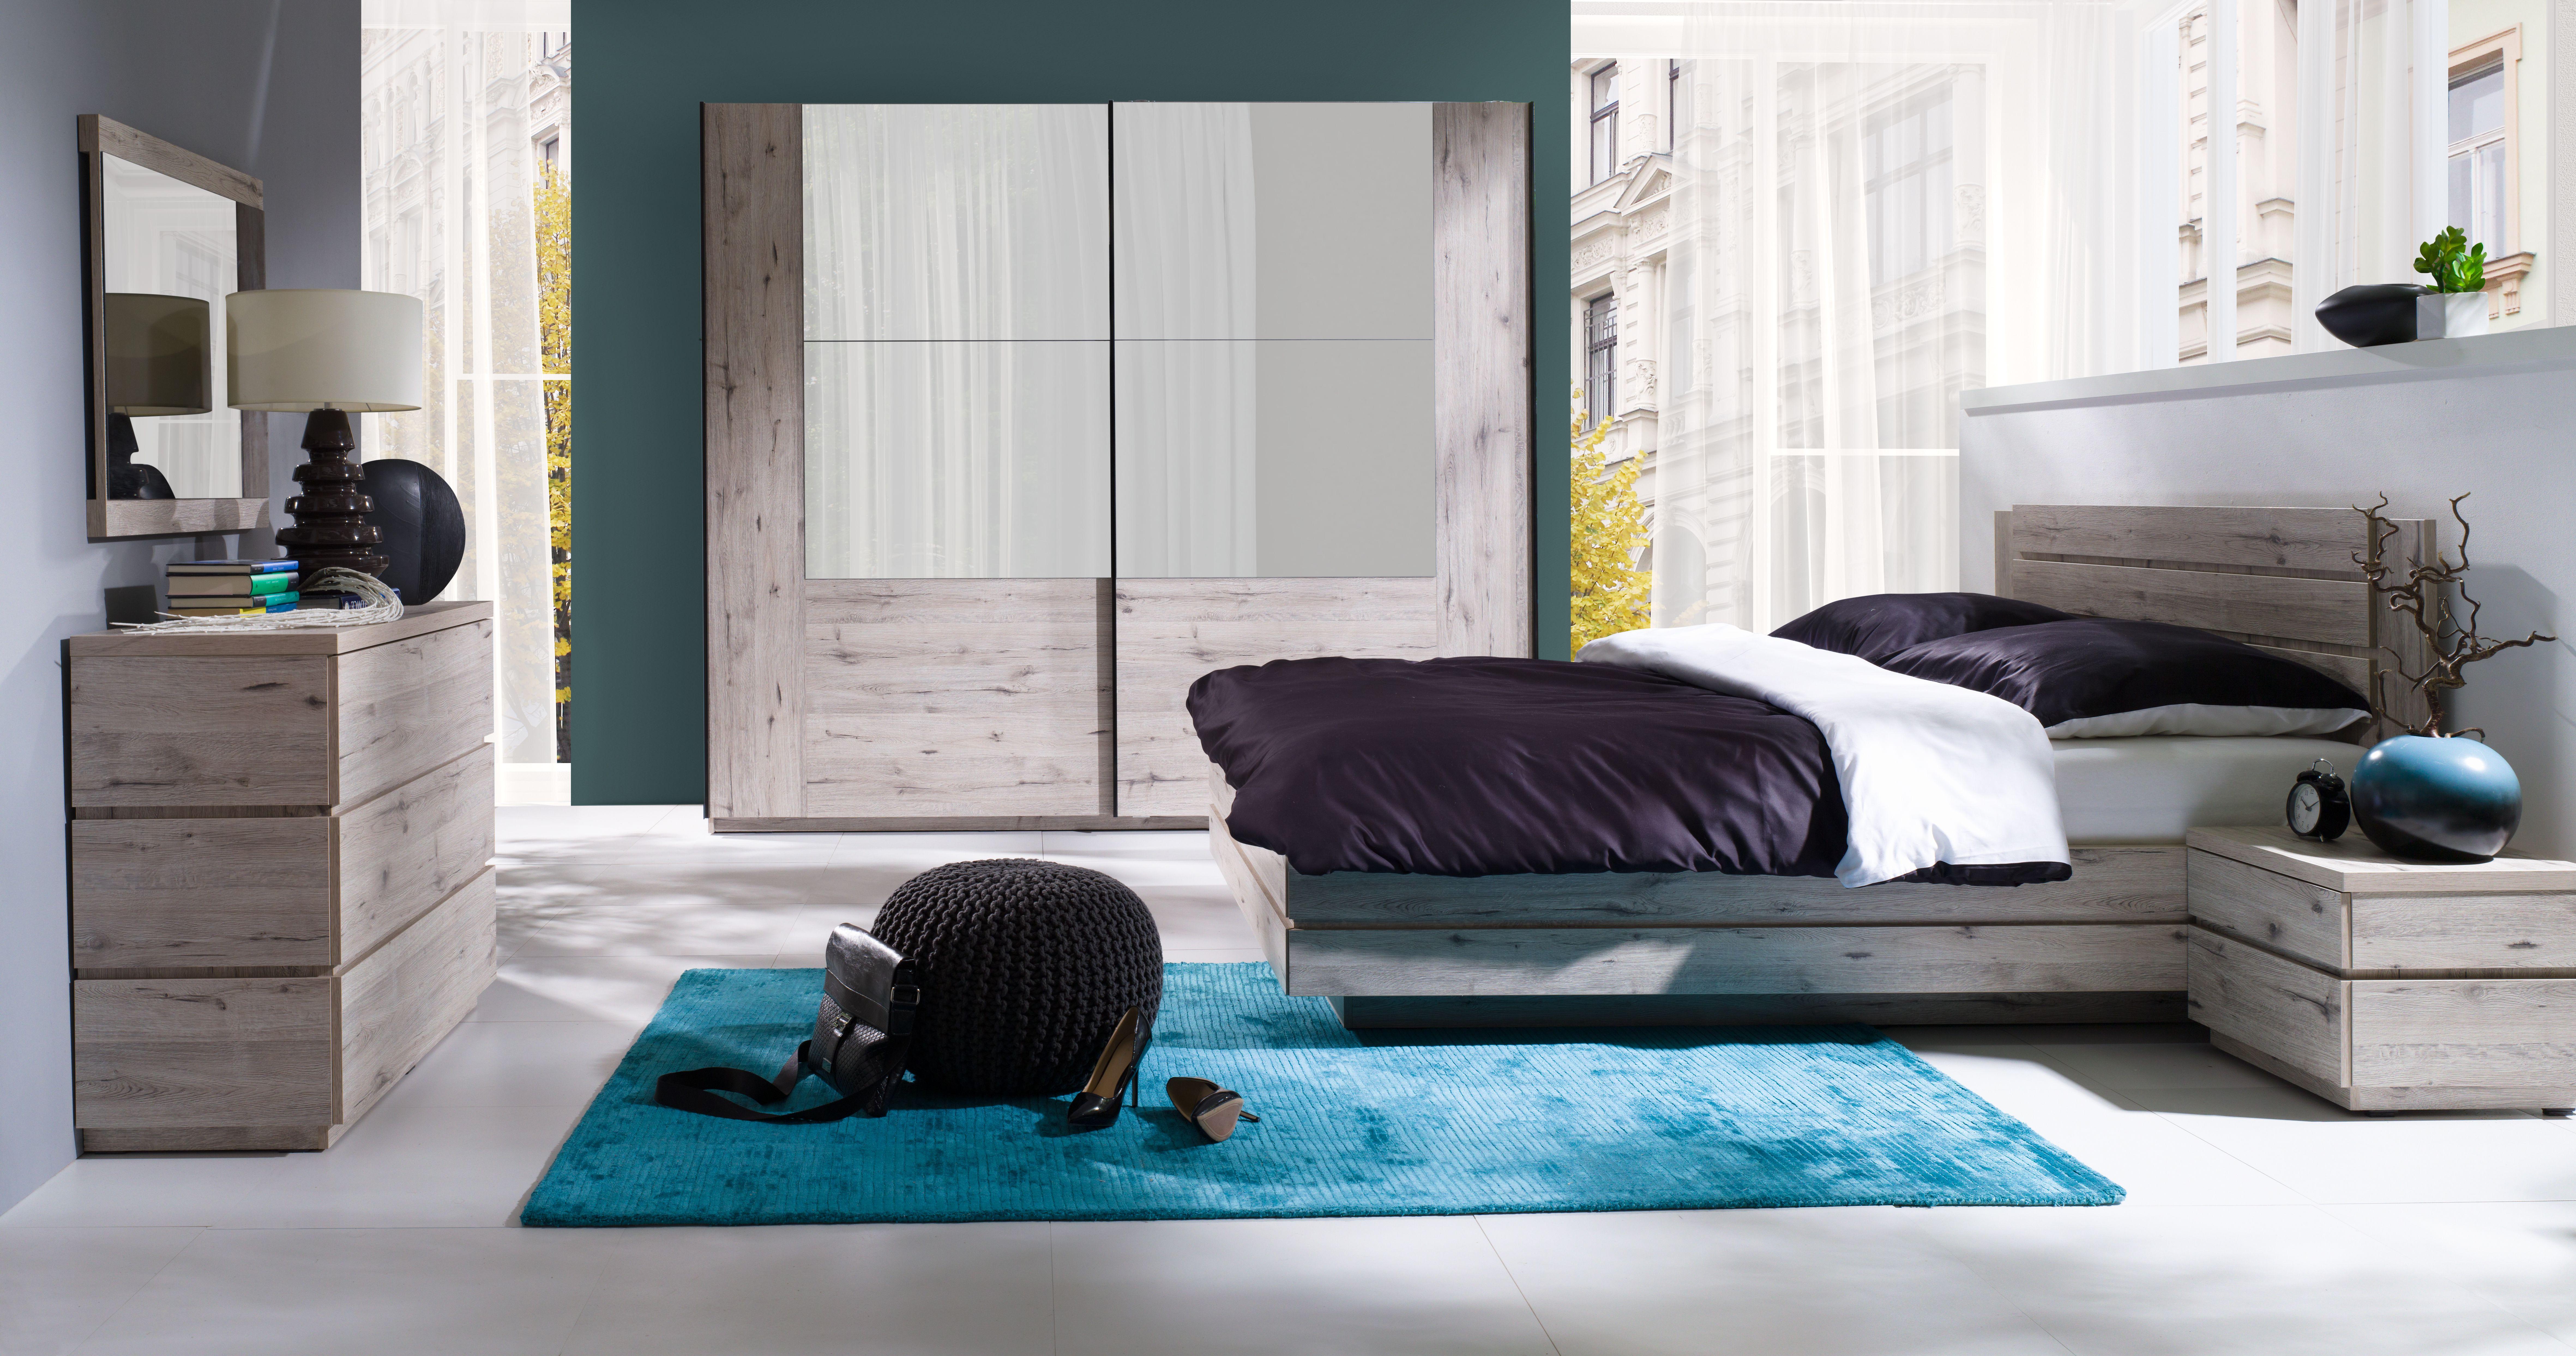 Moderne slaapkamer in origineel hout dekor met leuke details